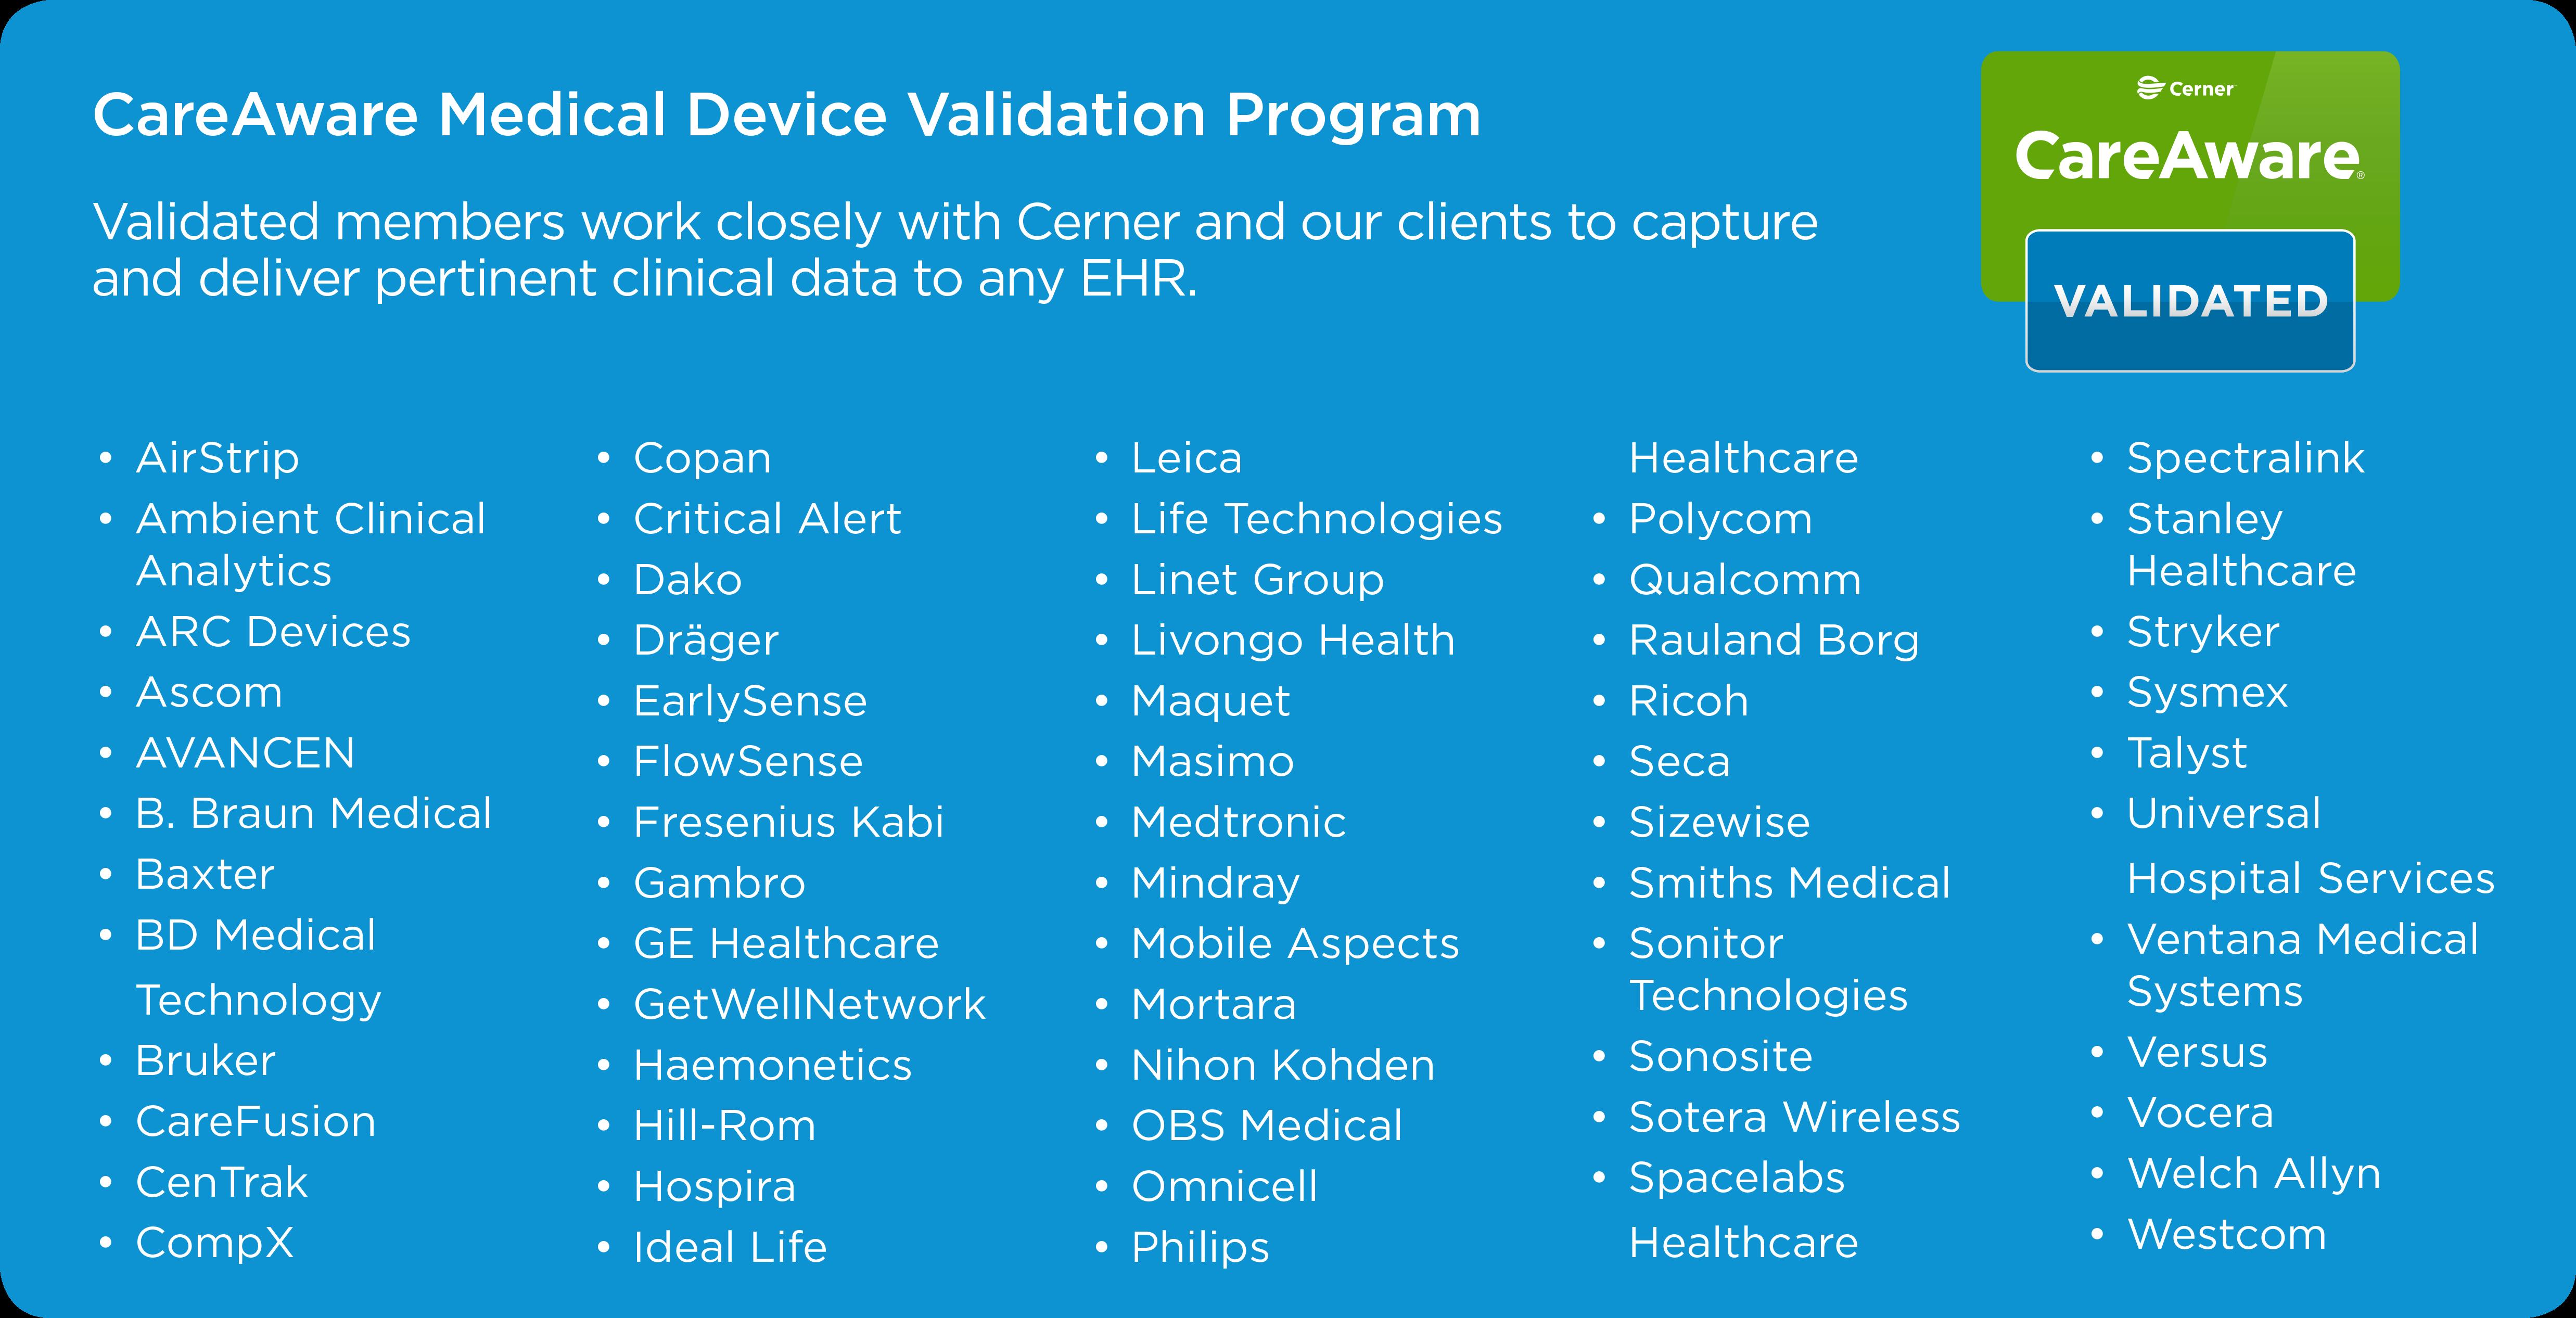 Cerner medical device certification program for a complete list of cerner validated partners and products please call 1 866 221 8877 or visit the careaware device driver list cerner clients only xflitez Images